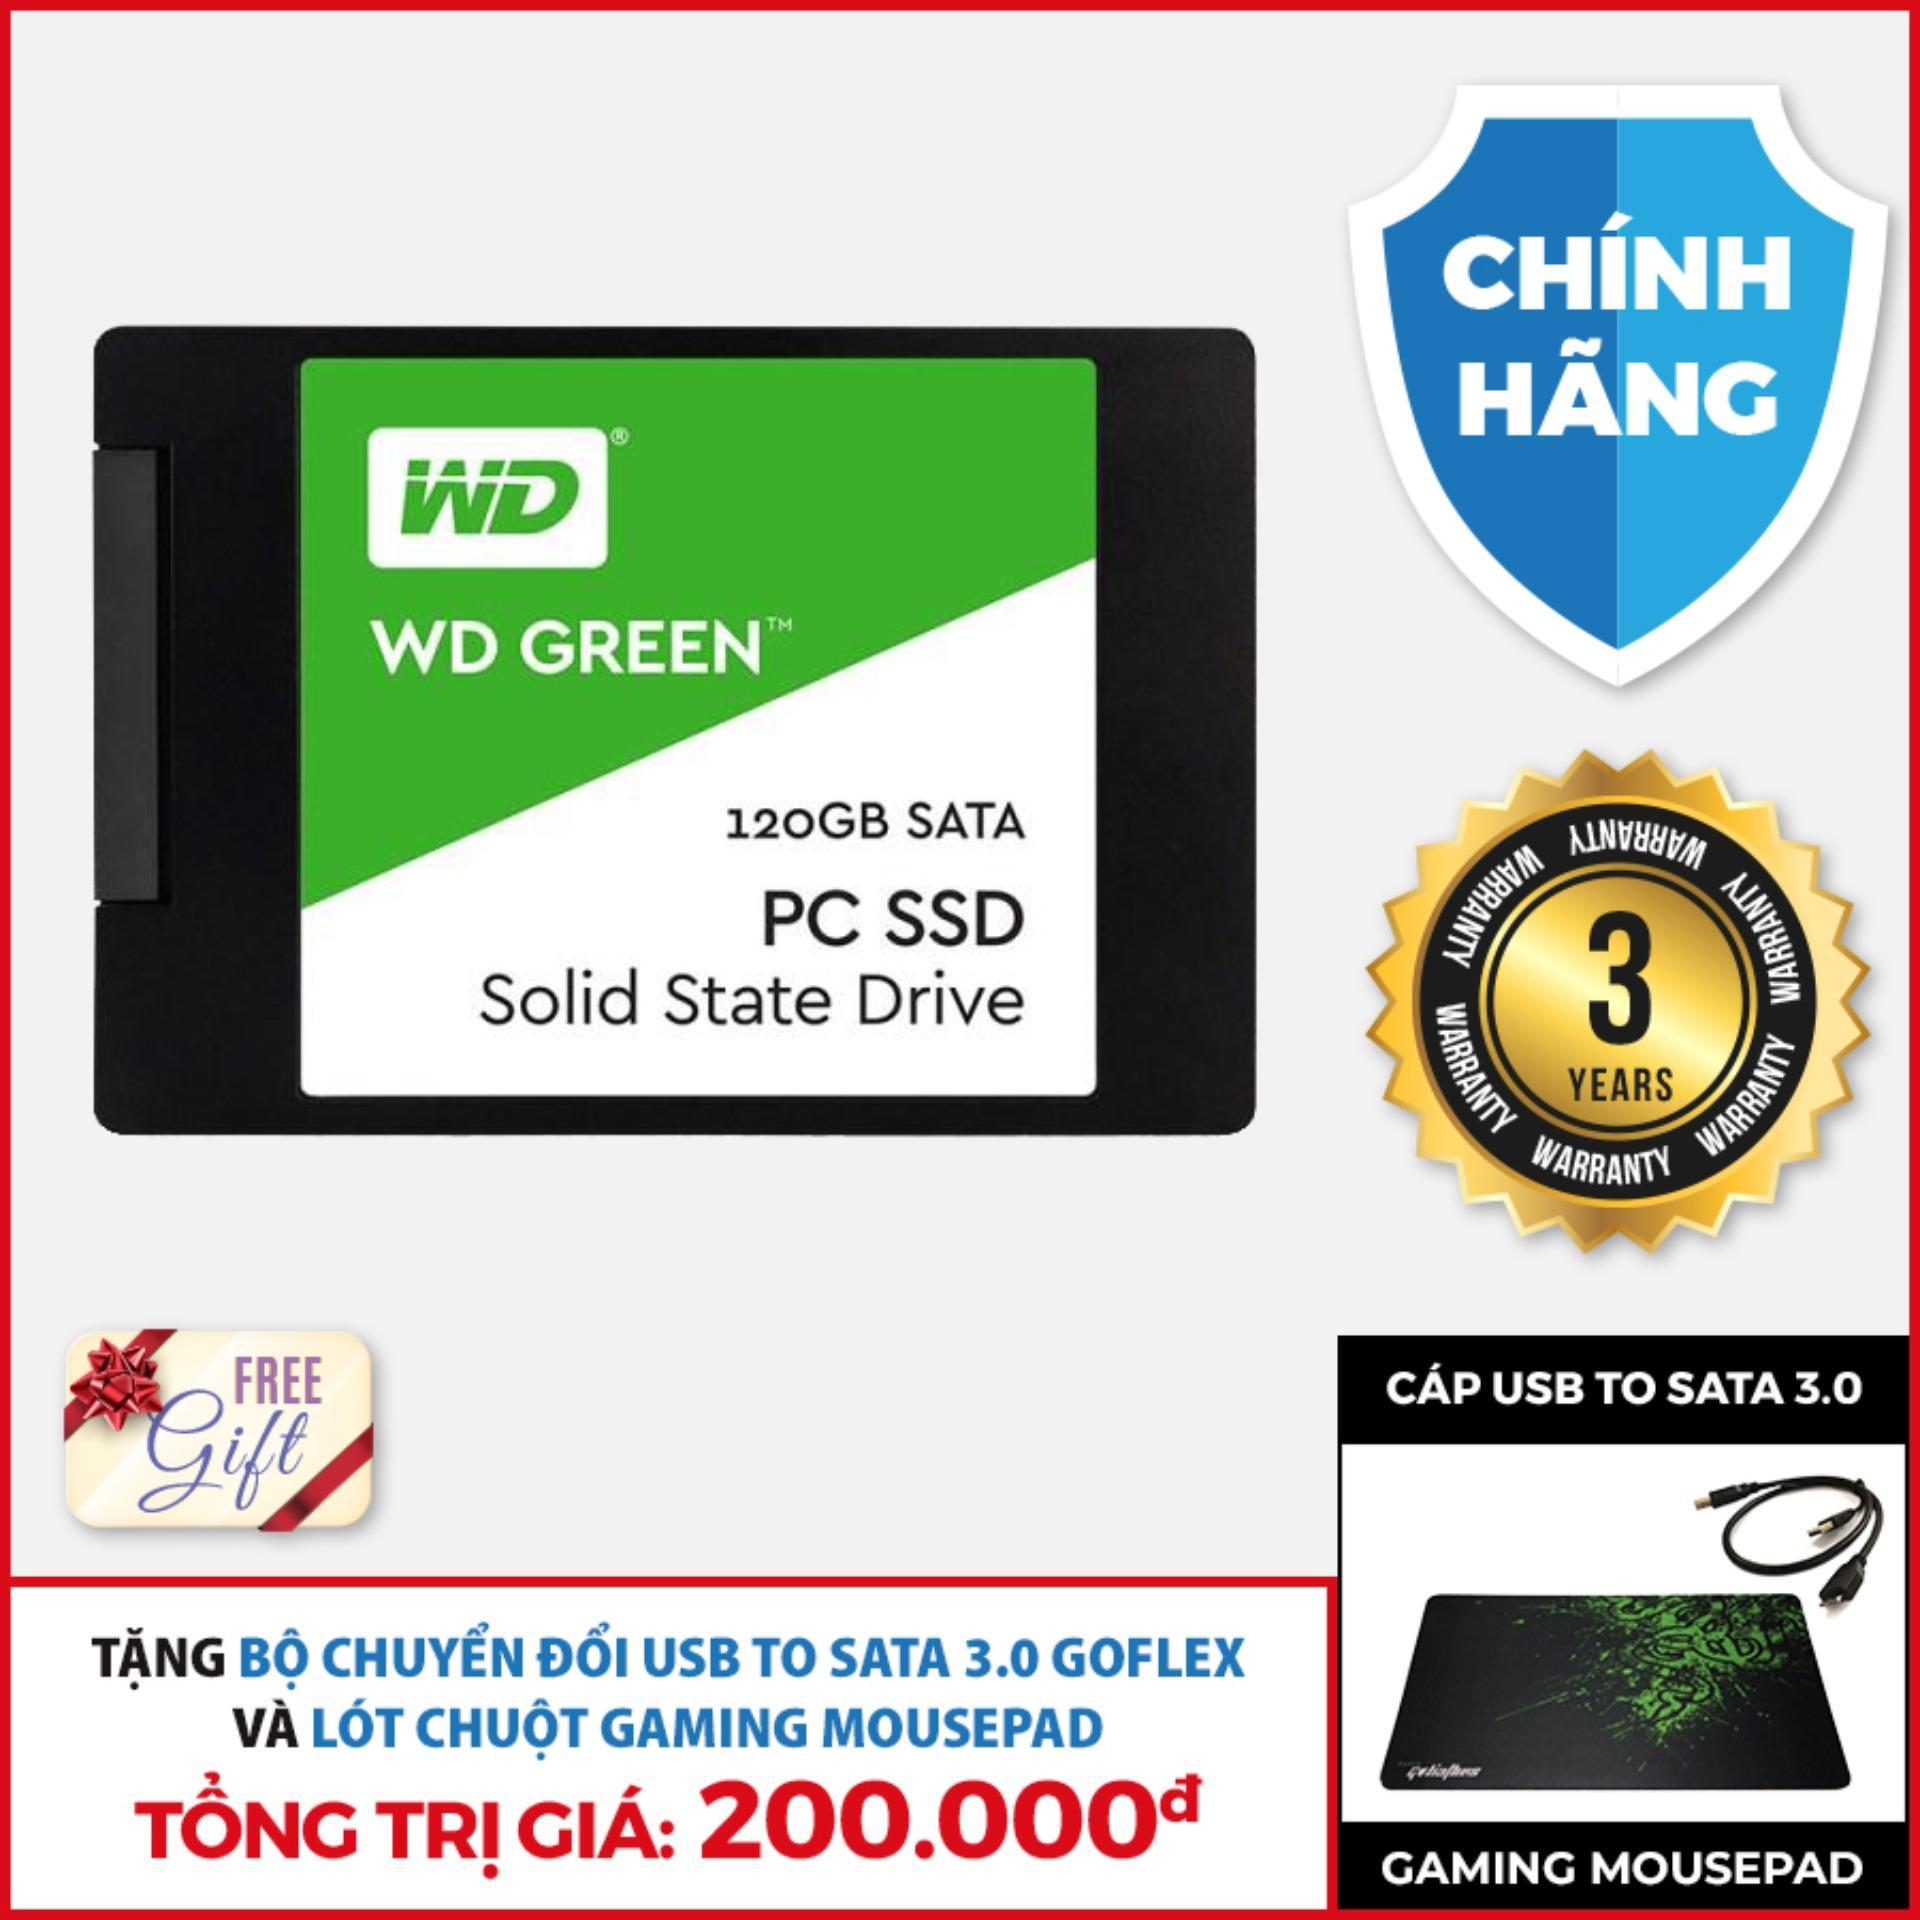 Giá Ổ cứng SSD WD Green 120Gb Sata 3, 2.5 inch Tại TIN HỌC TAT